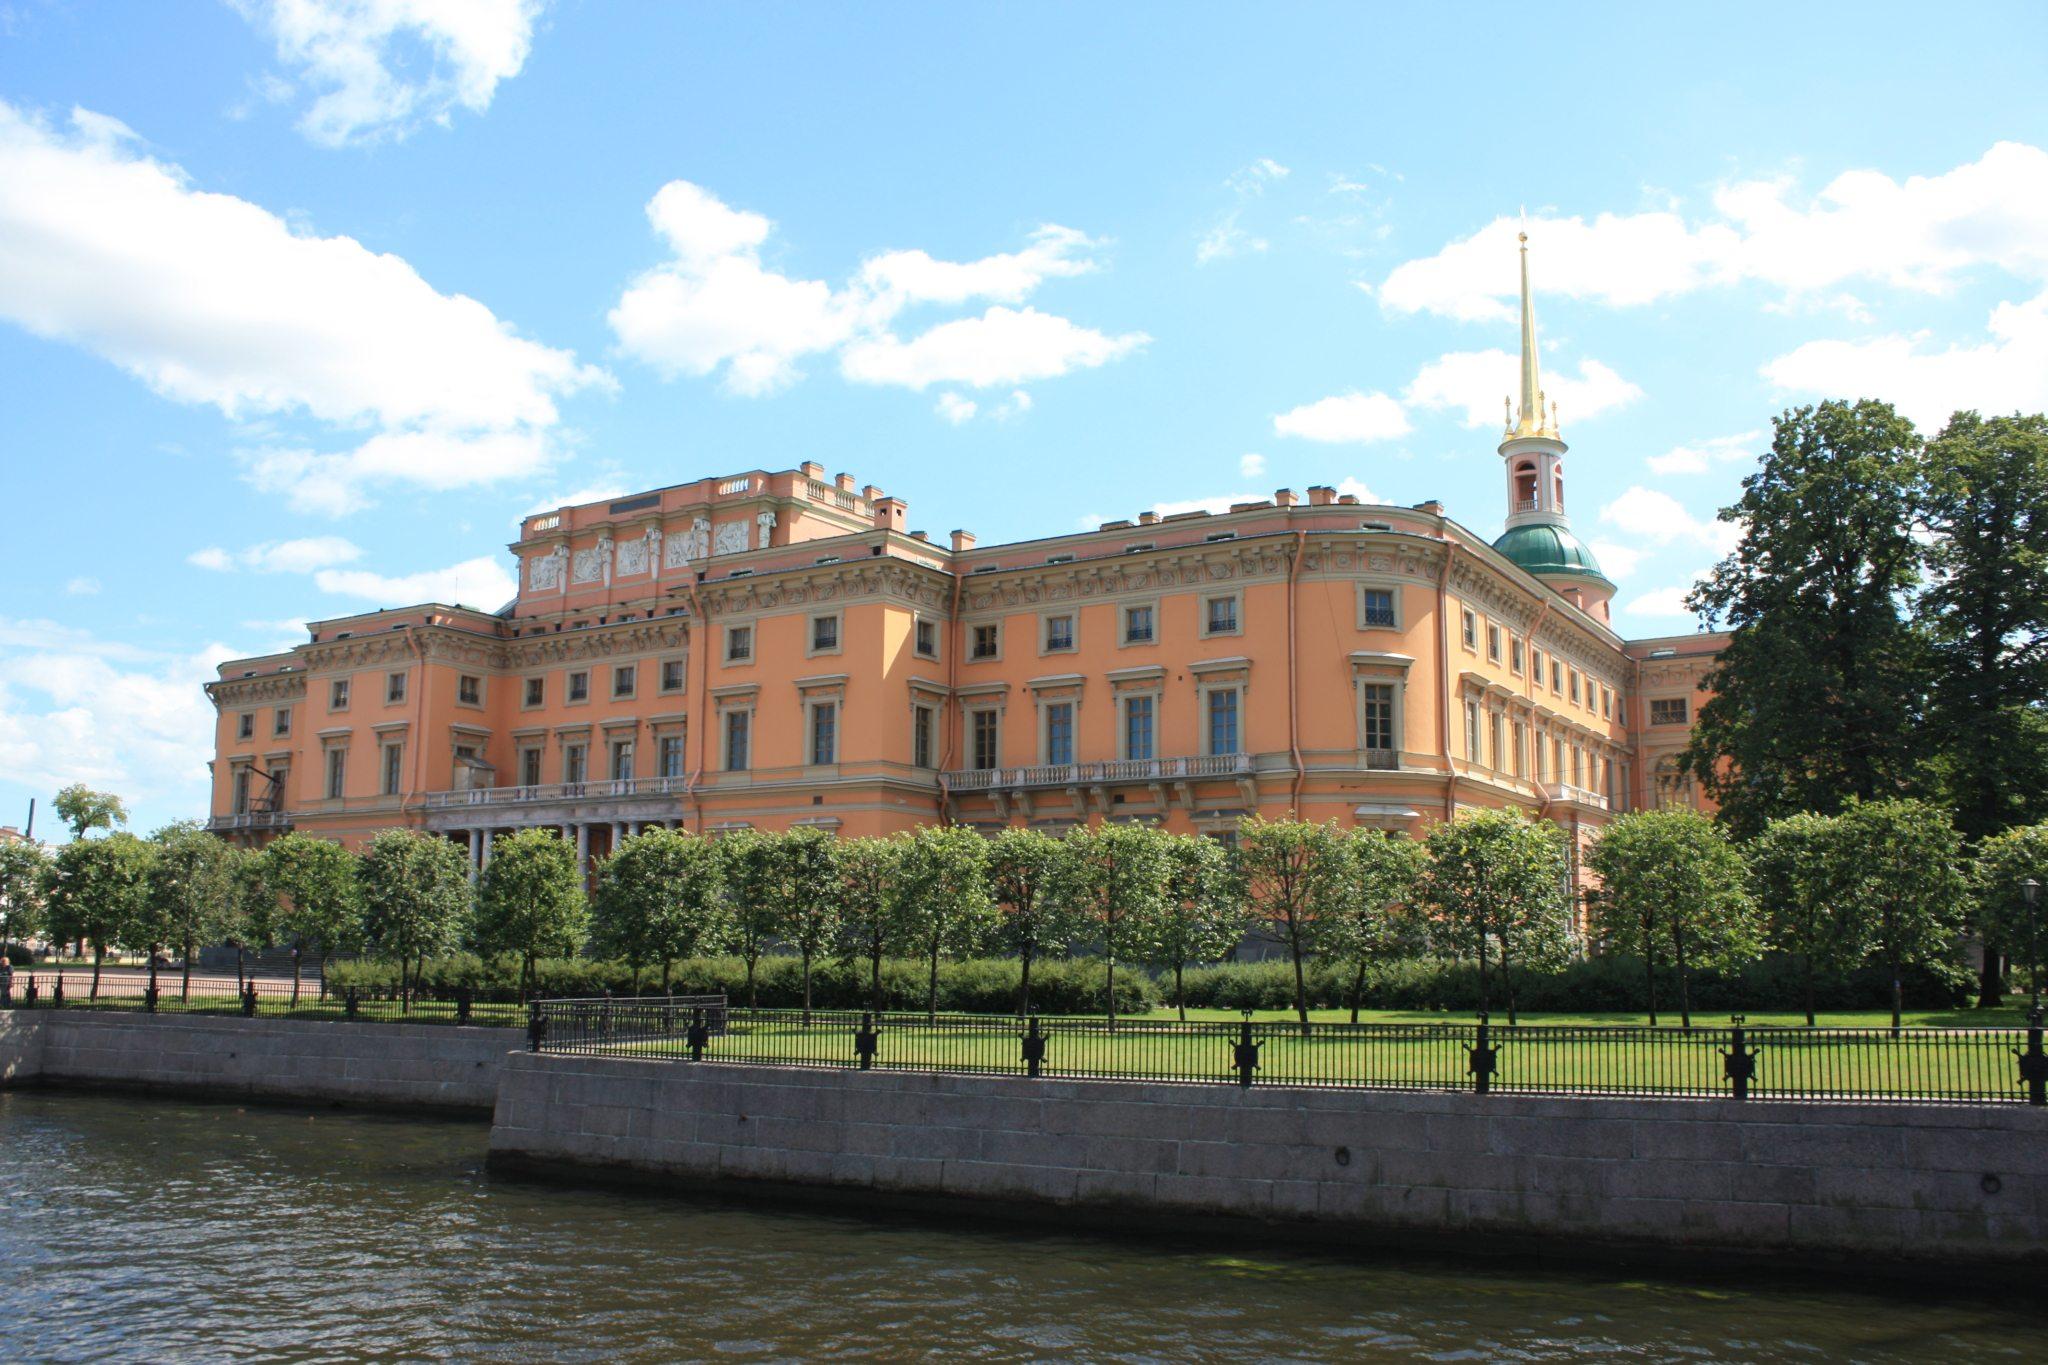 Михайловский замок - Saint Michael's Castle